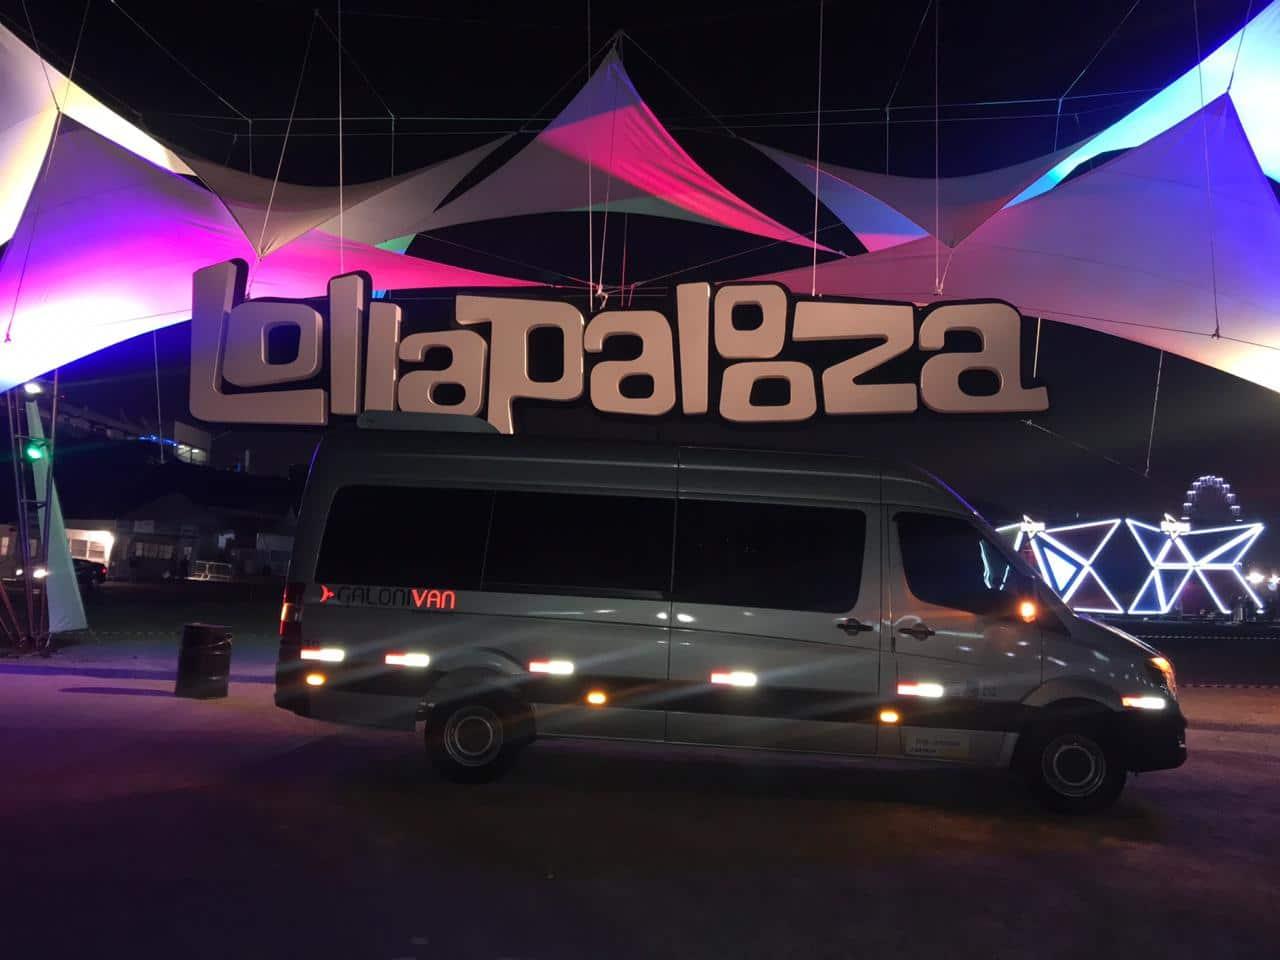 Van para Lollapalooza em São Paulo